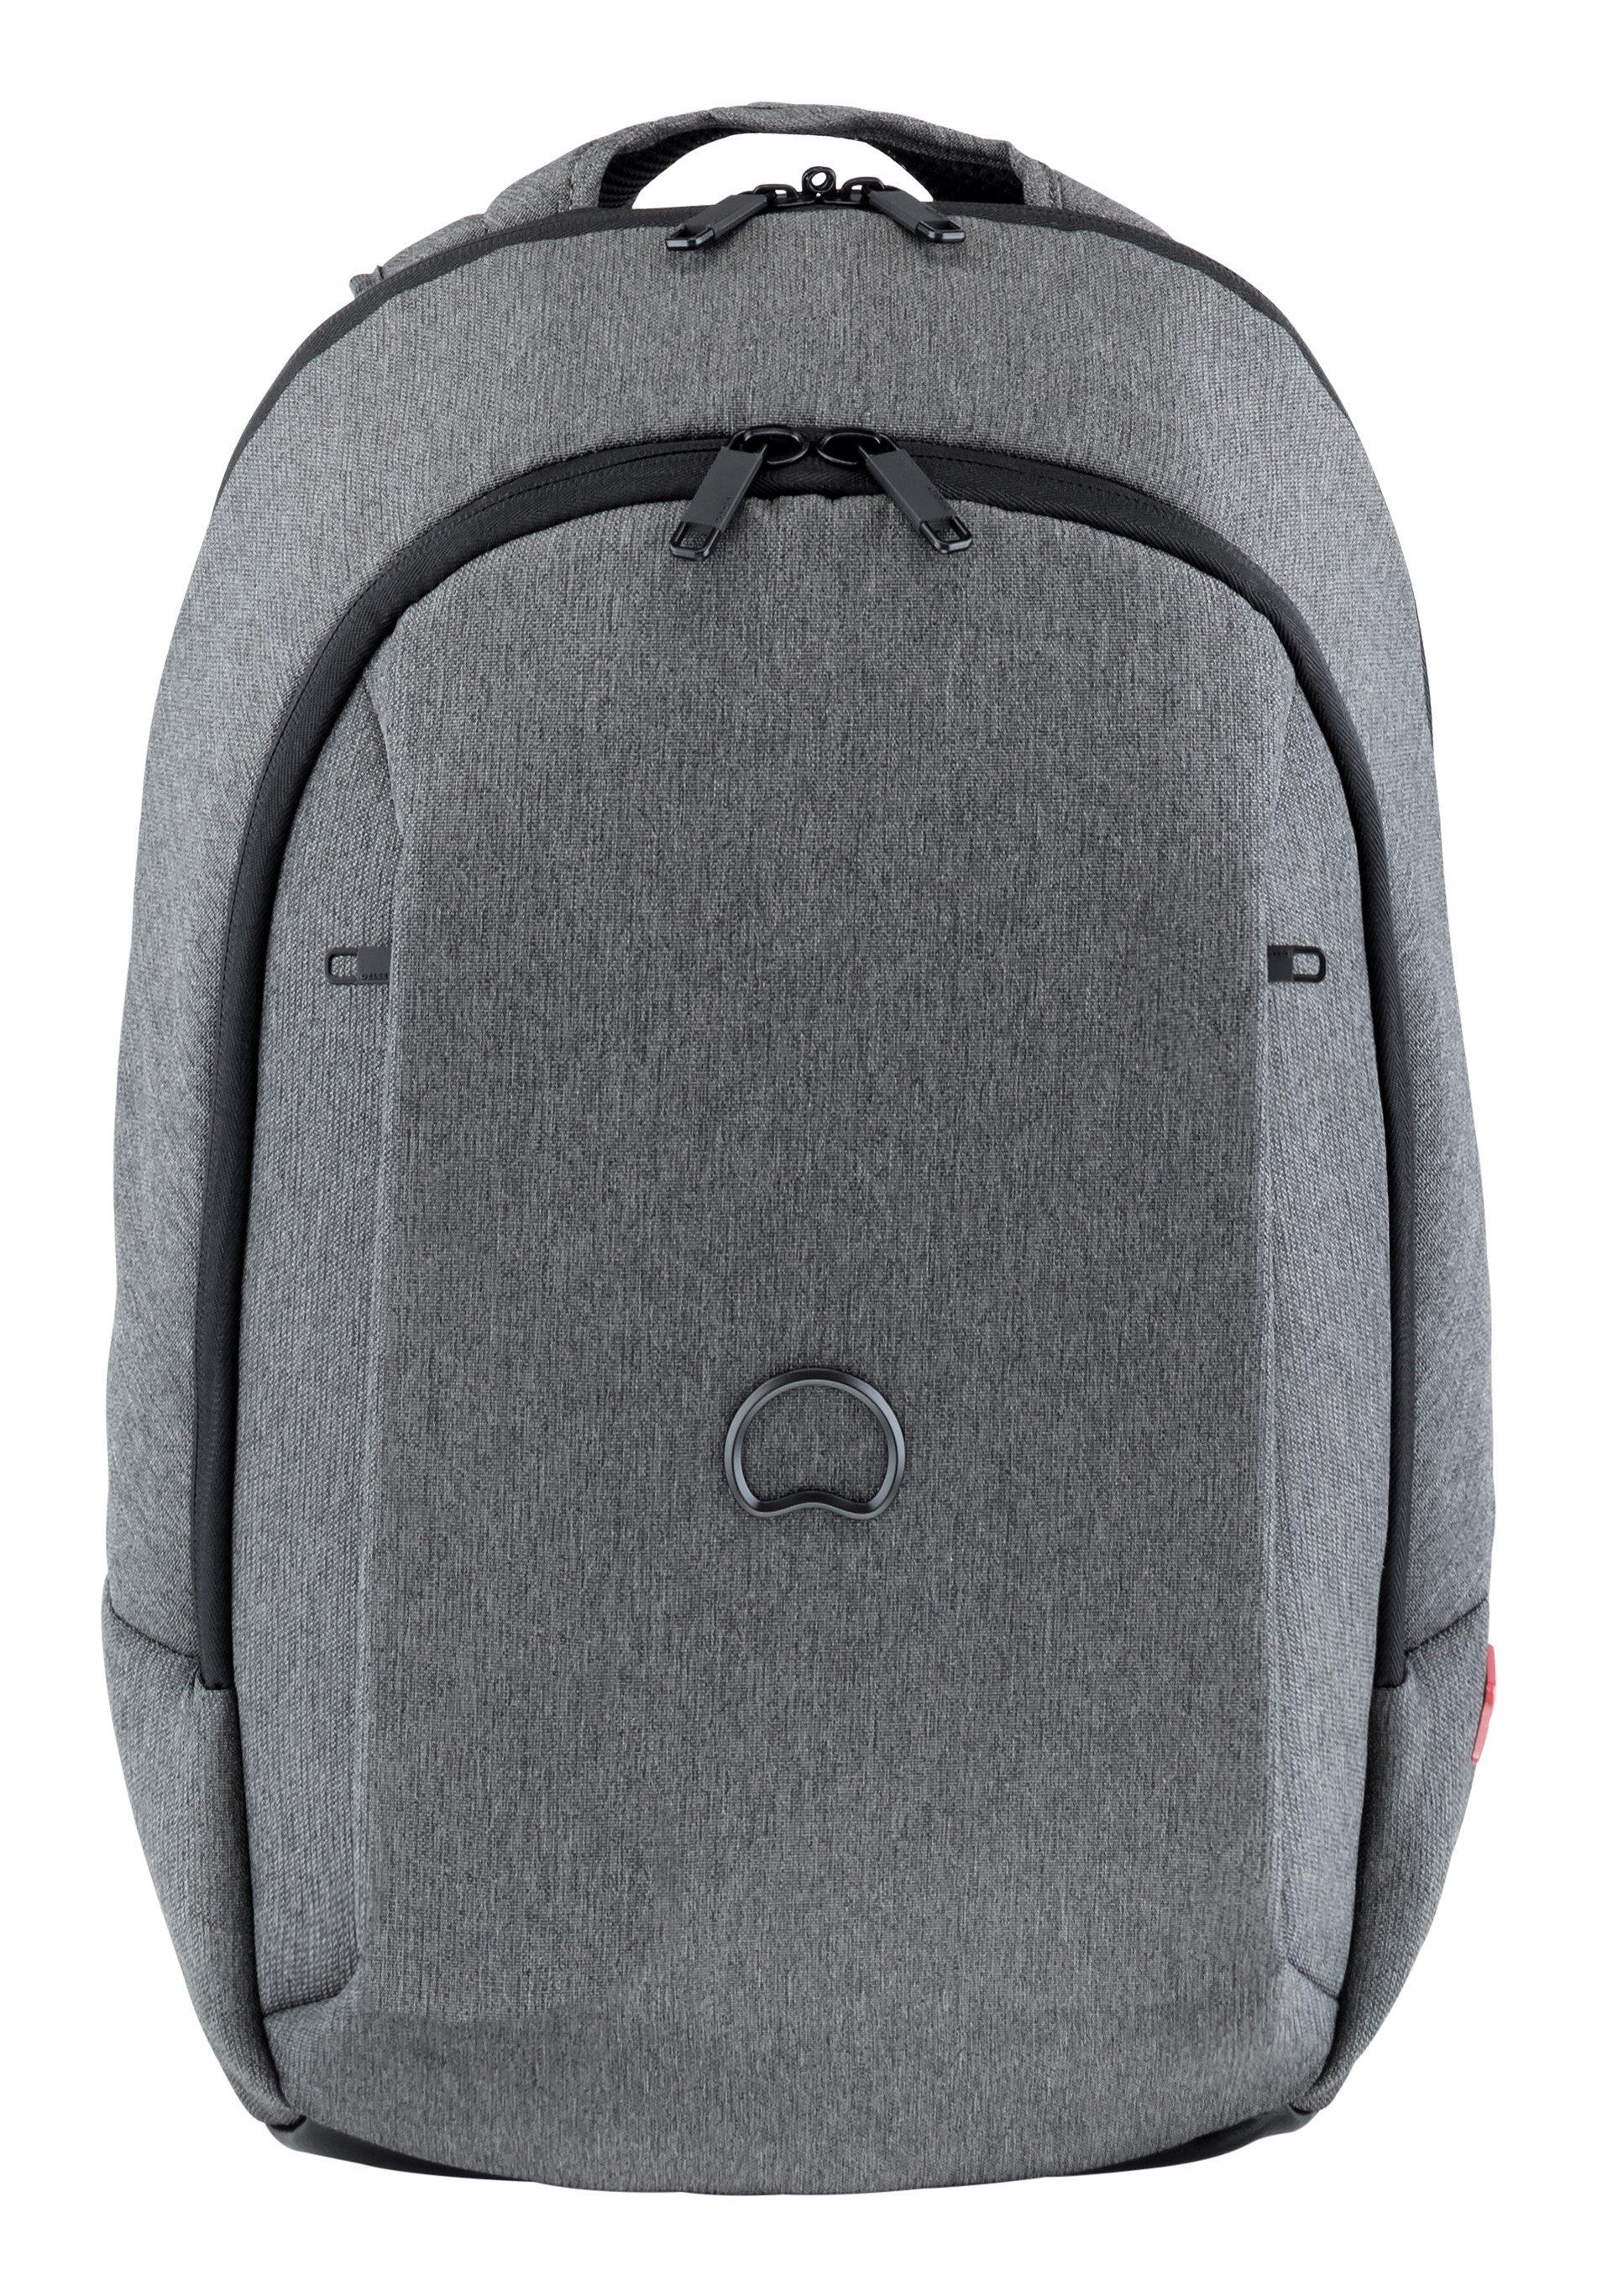 DELSEY Rucksack mit gepolstertem 14-Zoll Laptopfach, »Mouvement«